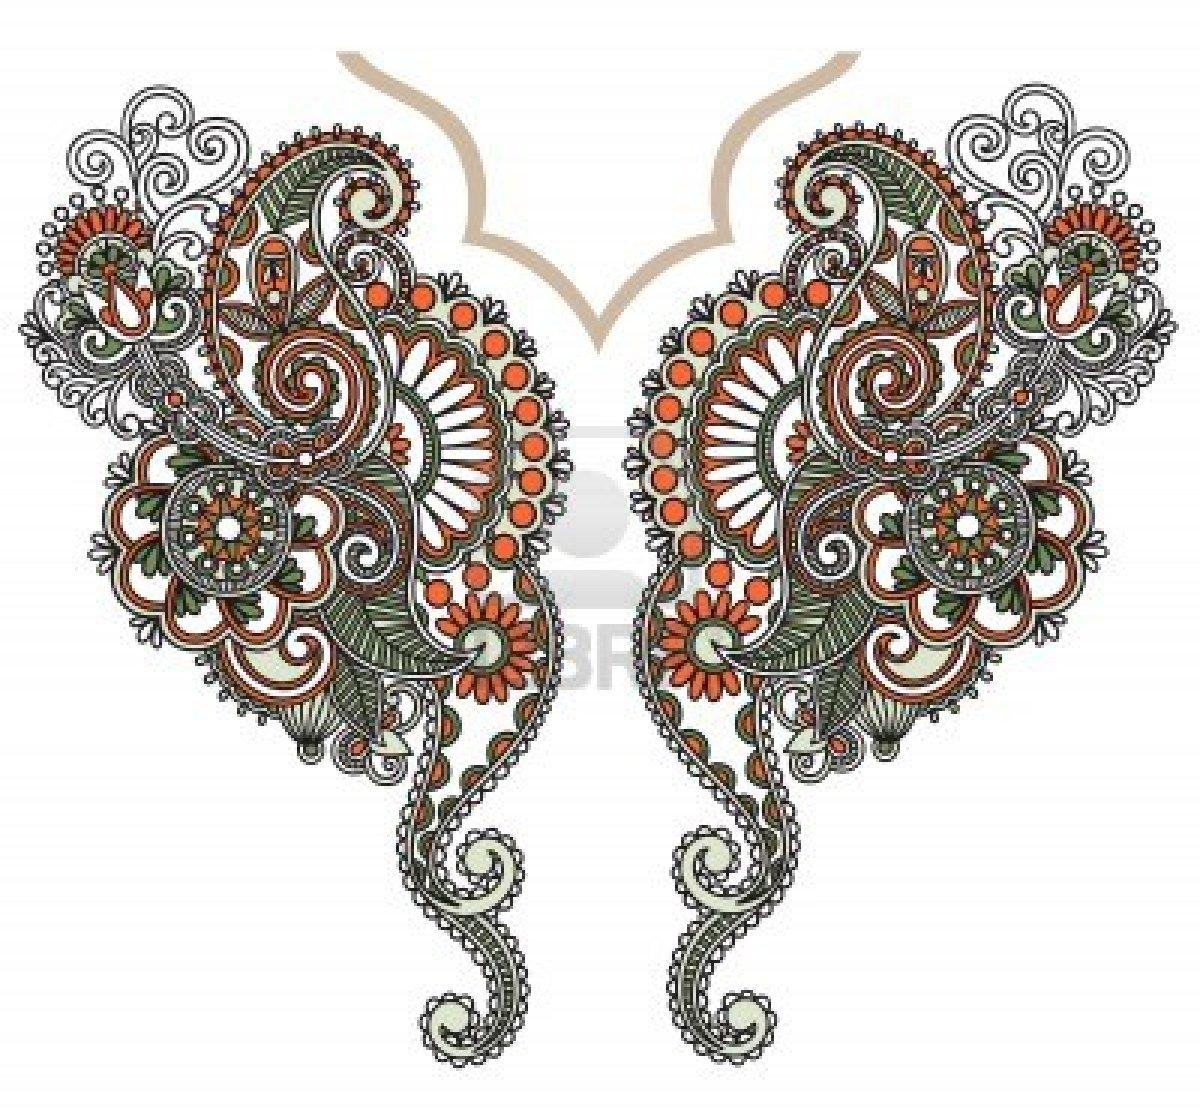 Embroidery designs neck patali kali